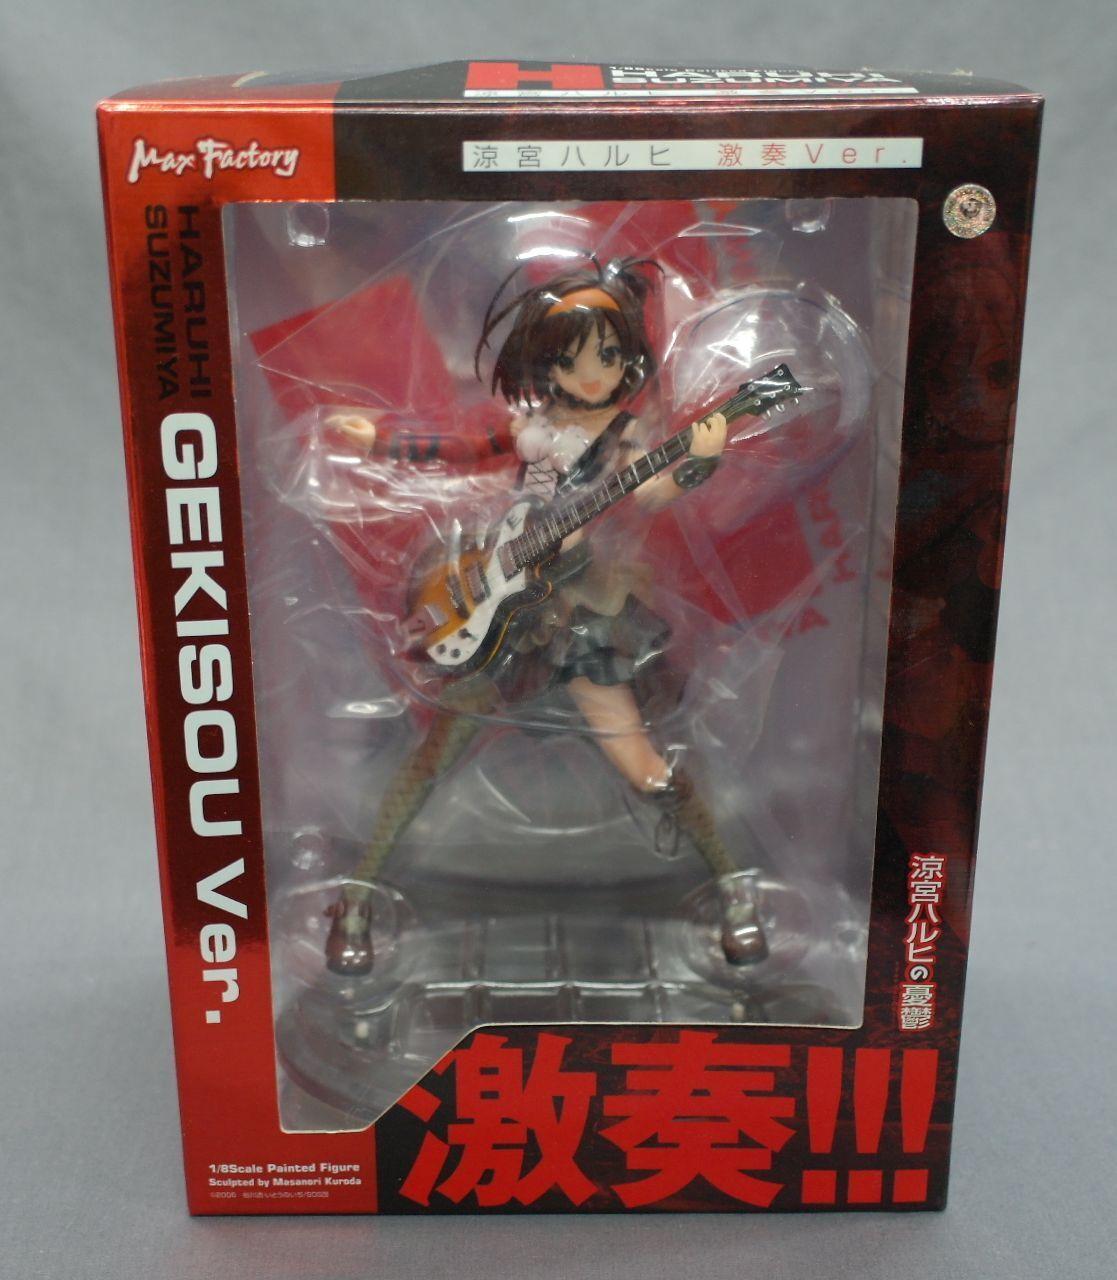 Figurine Haruhi Suzumiya  Gekisou ver Max Factory  Comme neuf Condition  Japan B40  bas prix